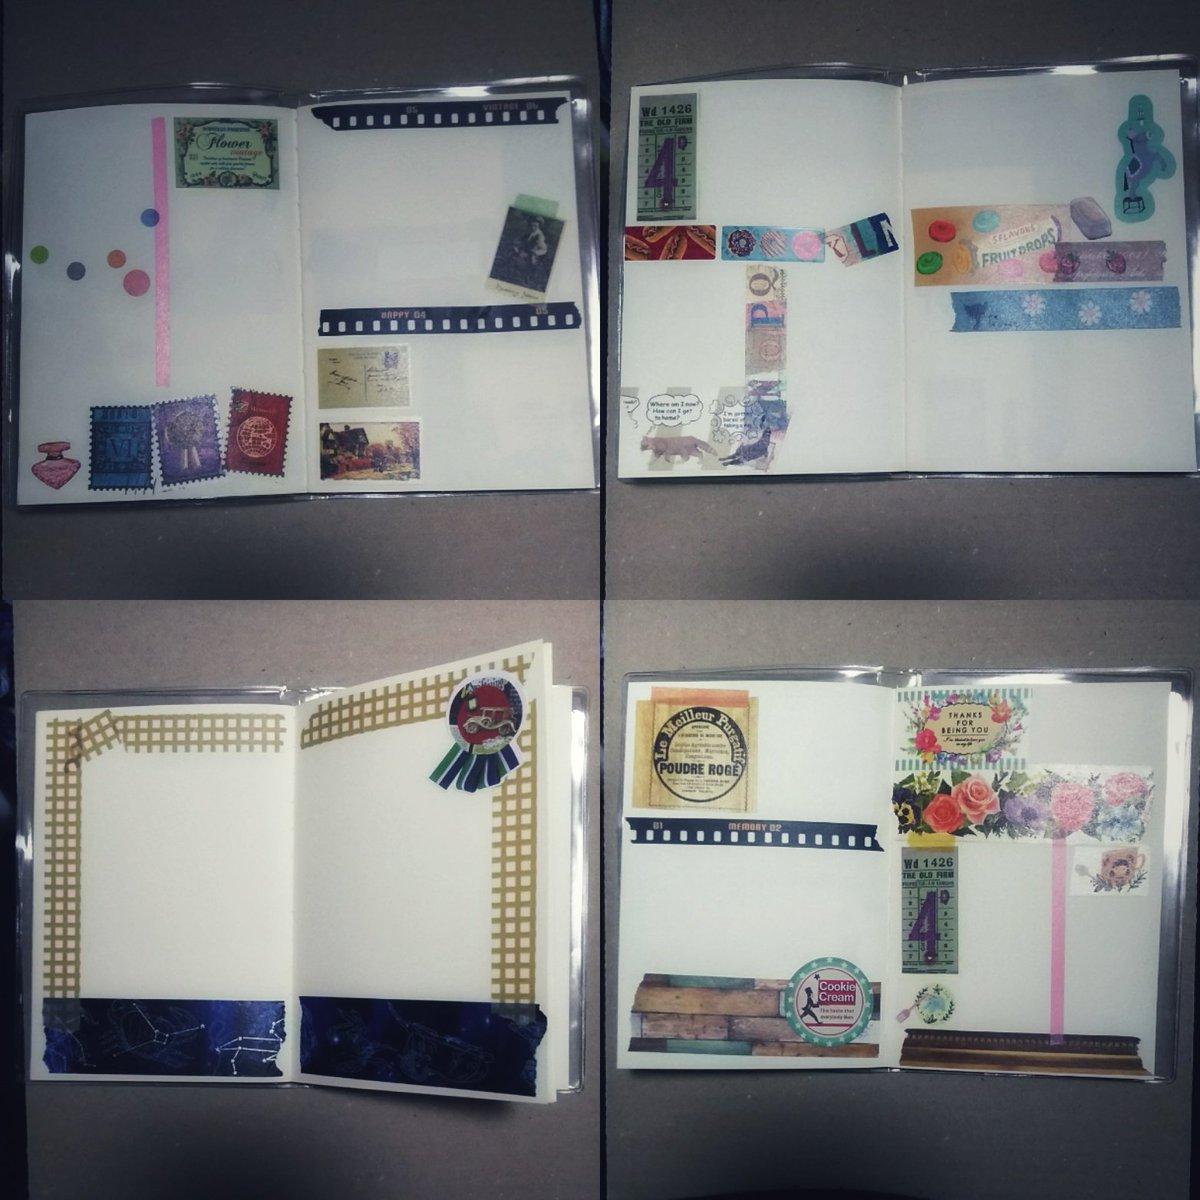 test ツイッターメディア - 今、Instagramに投稿して来たノート。Instagram、いつまで経っても使い慣れない(;A´▽`A  #東京アンティーク #ダイソー #セリア #ノート #マスキングテープ #文房具 #notebook https://t.co/VJIwGpnK8Q